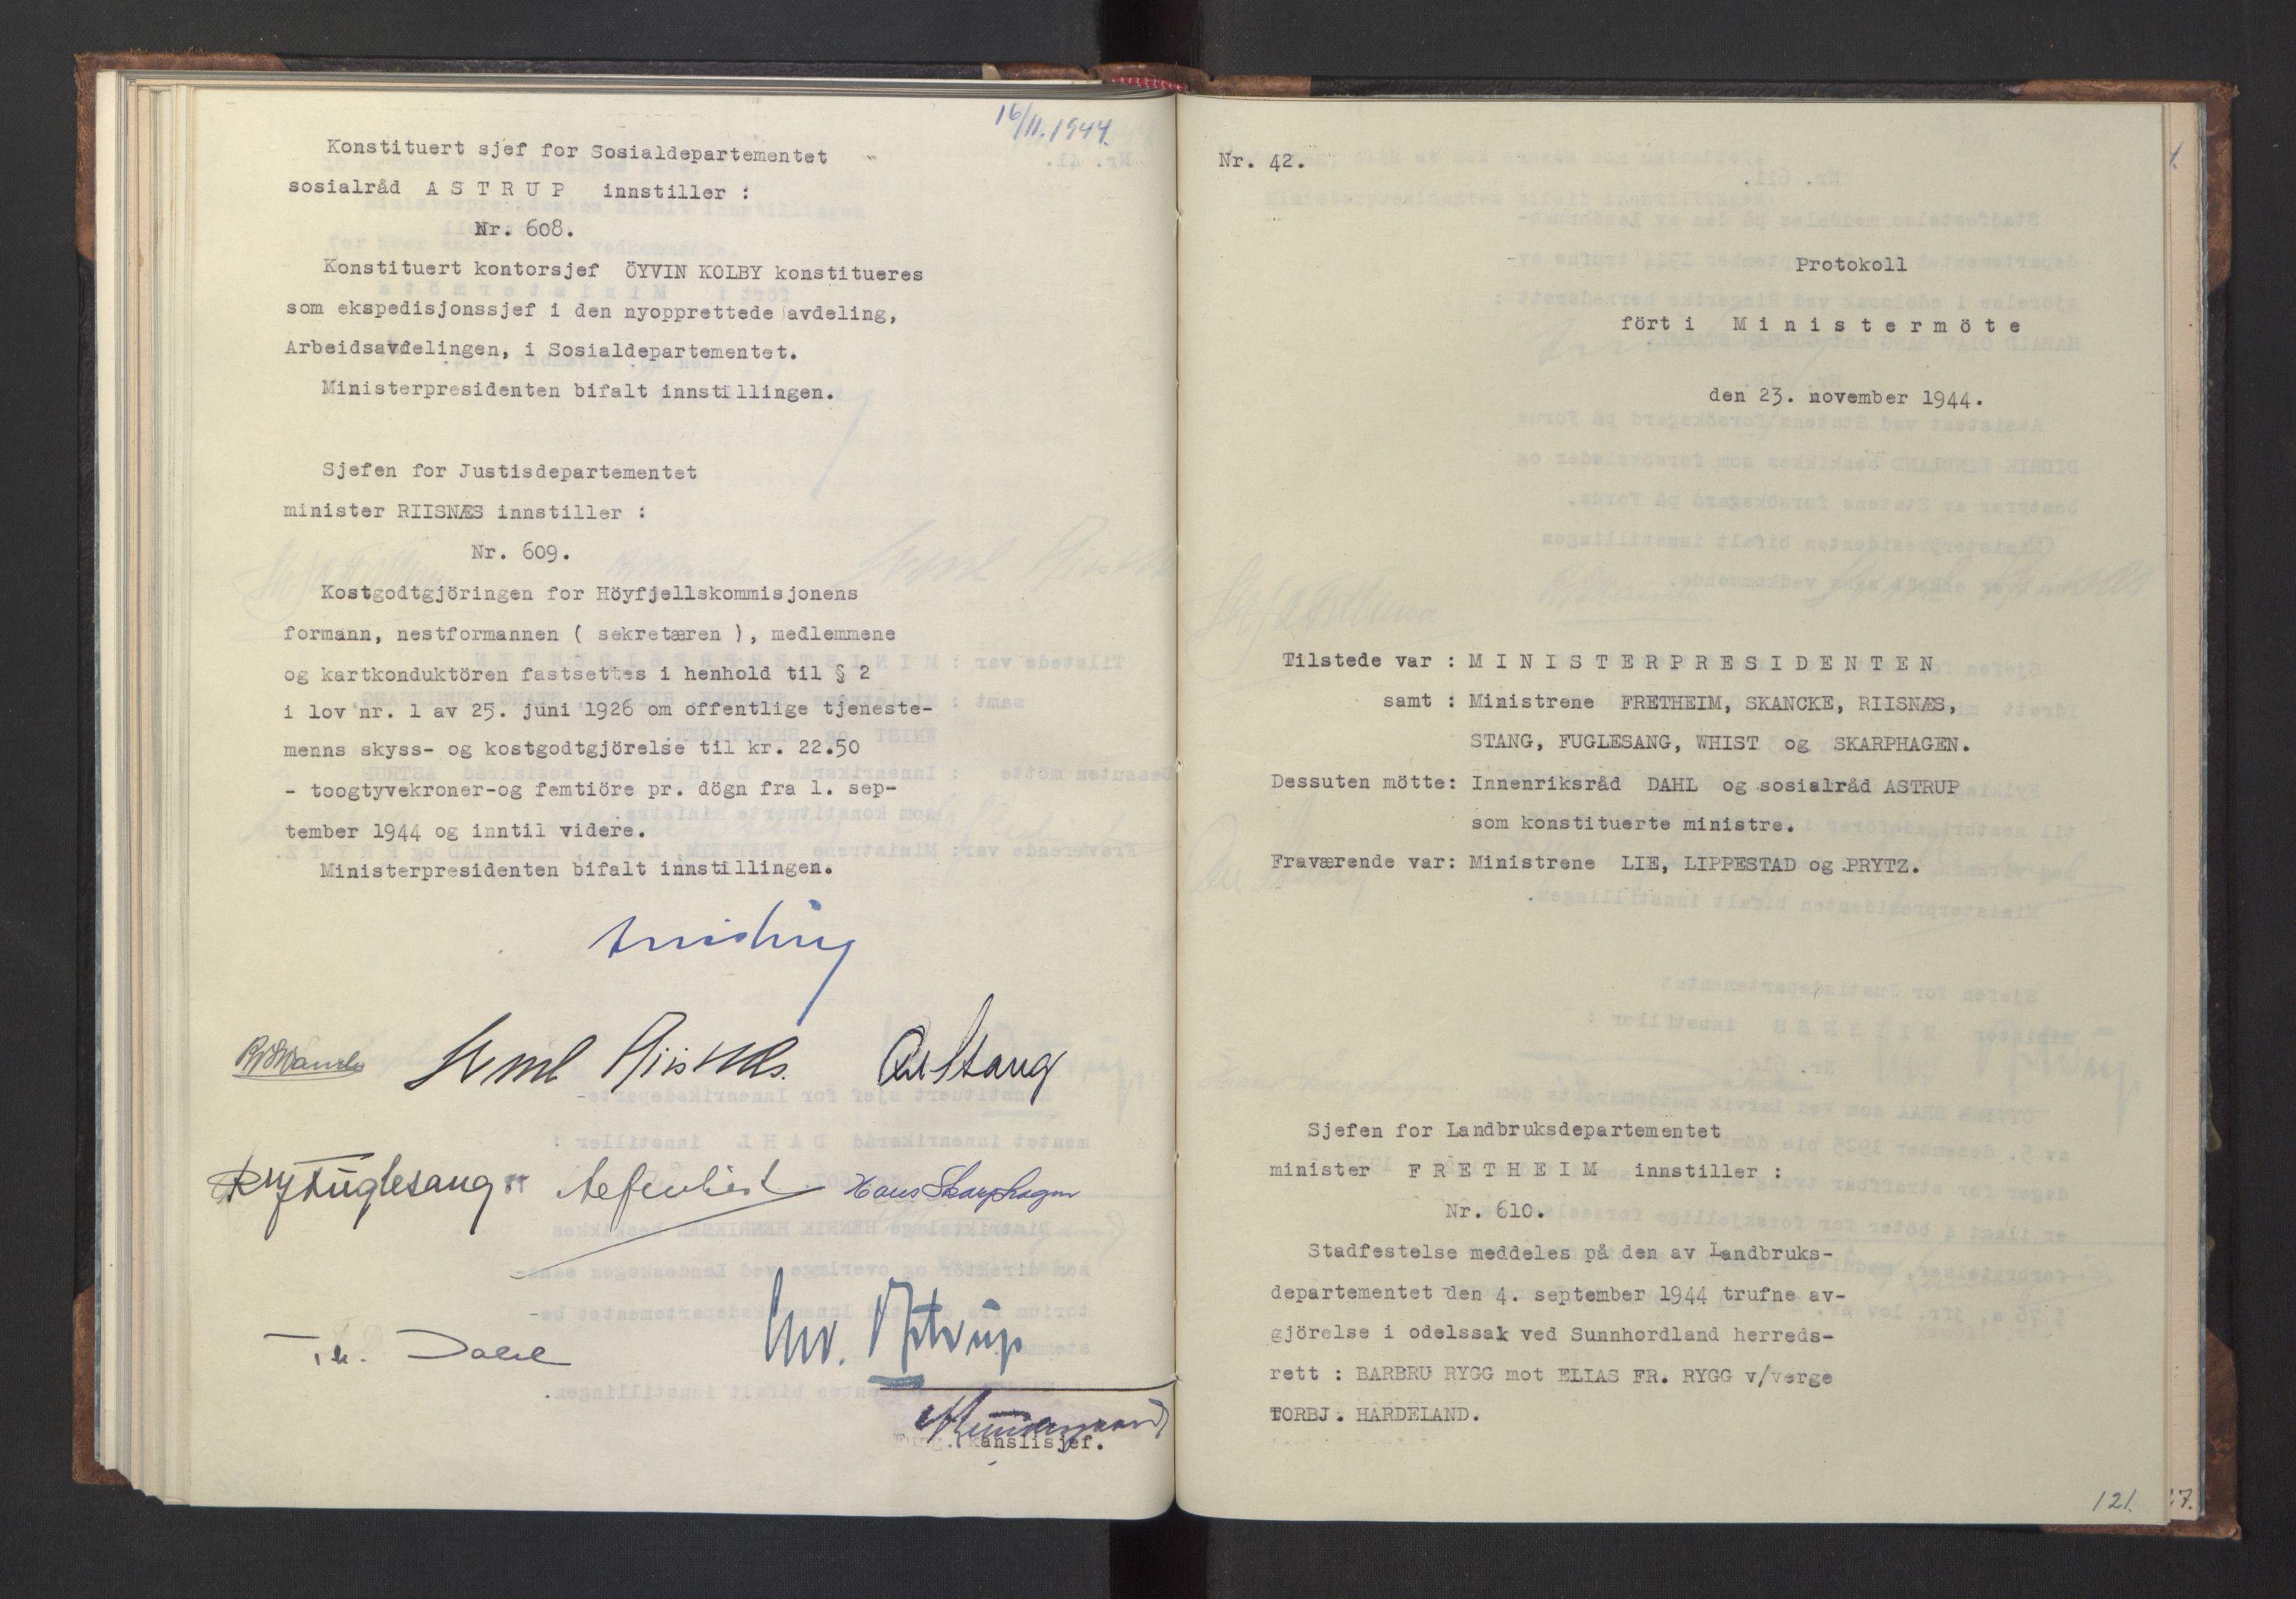 RA, NS-administrasjonen 1940-1945 (Statsrådsekretariatet, de kommisariske statsråder mm), D/Da/L0005: Protokoll fra ministermøter, 1944, s. 120b-121a